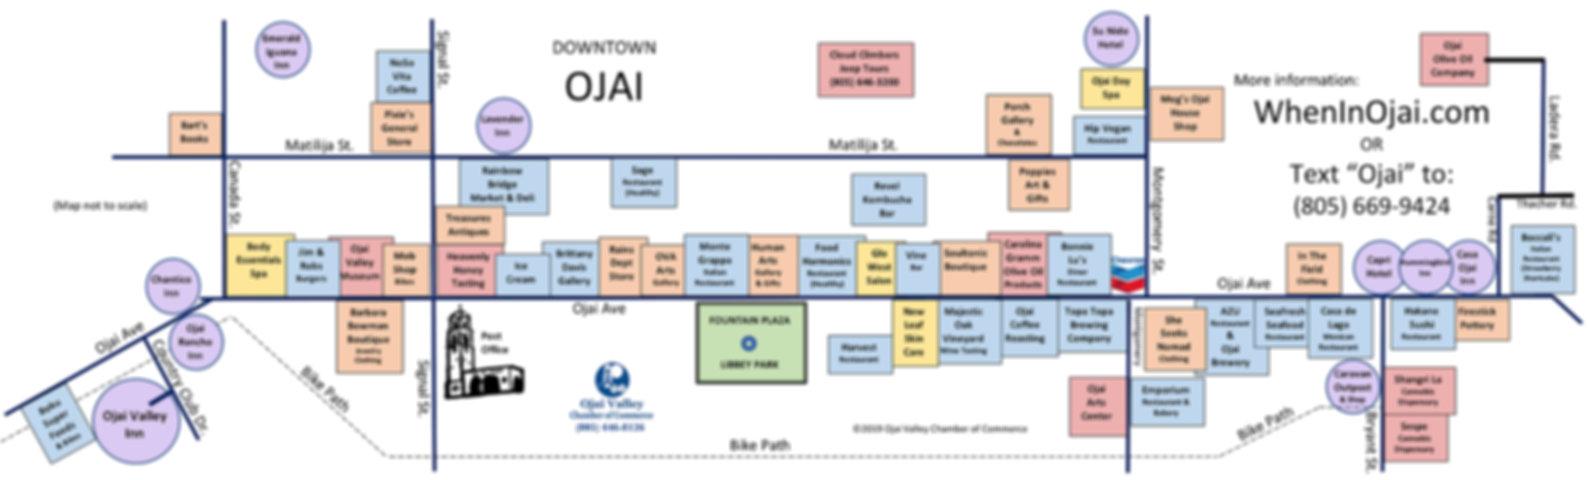 Ojai Map.jpg